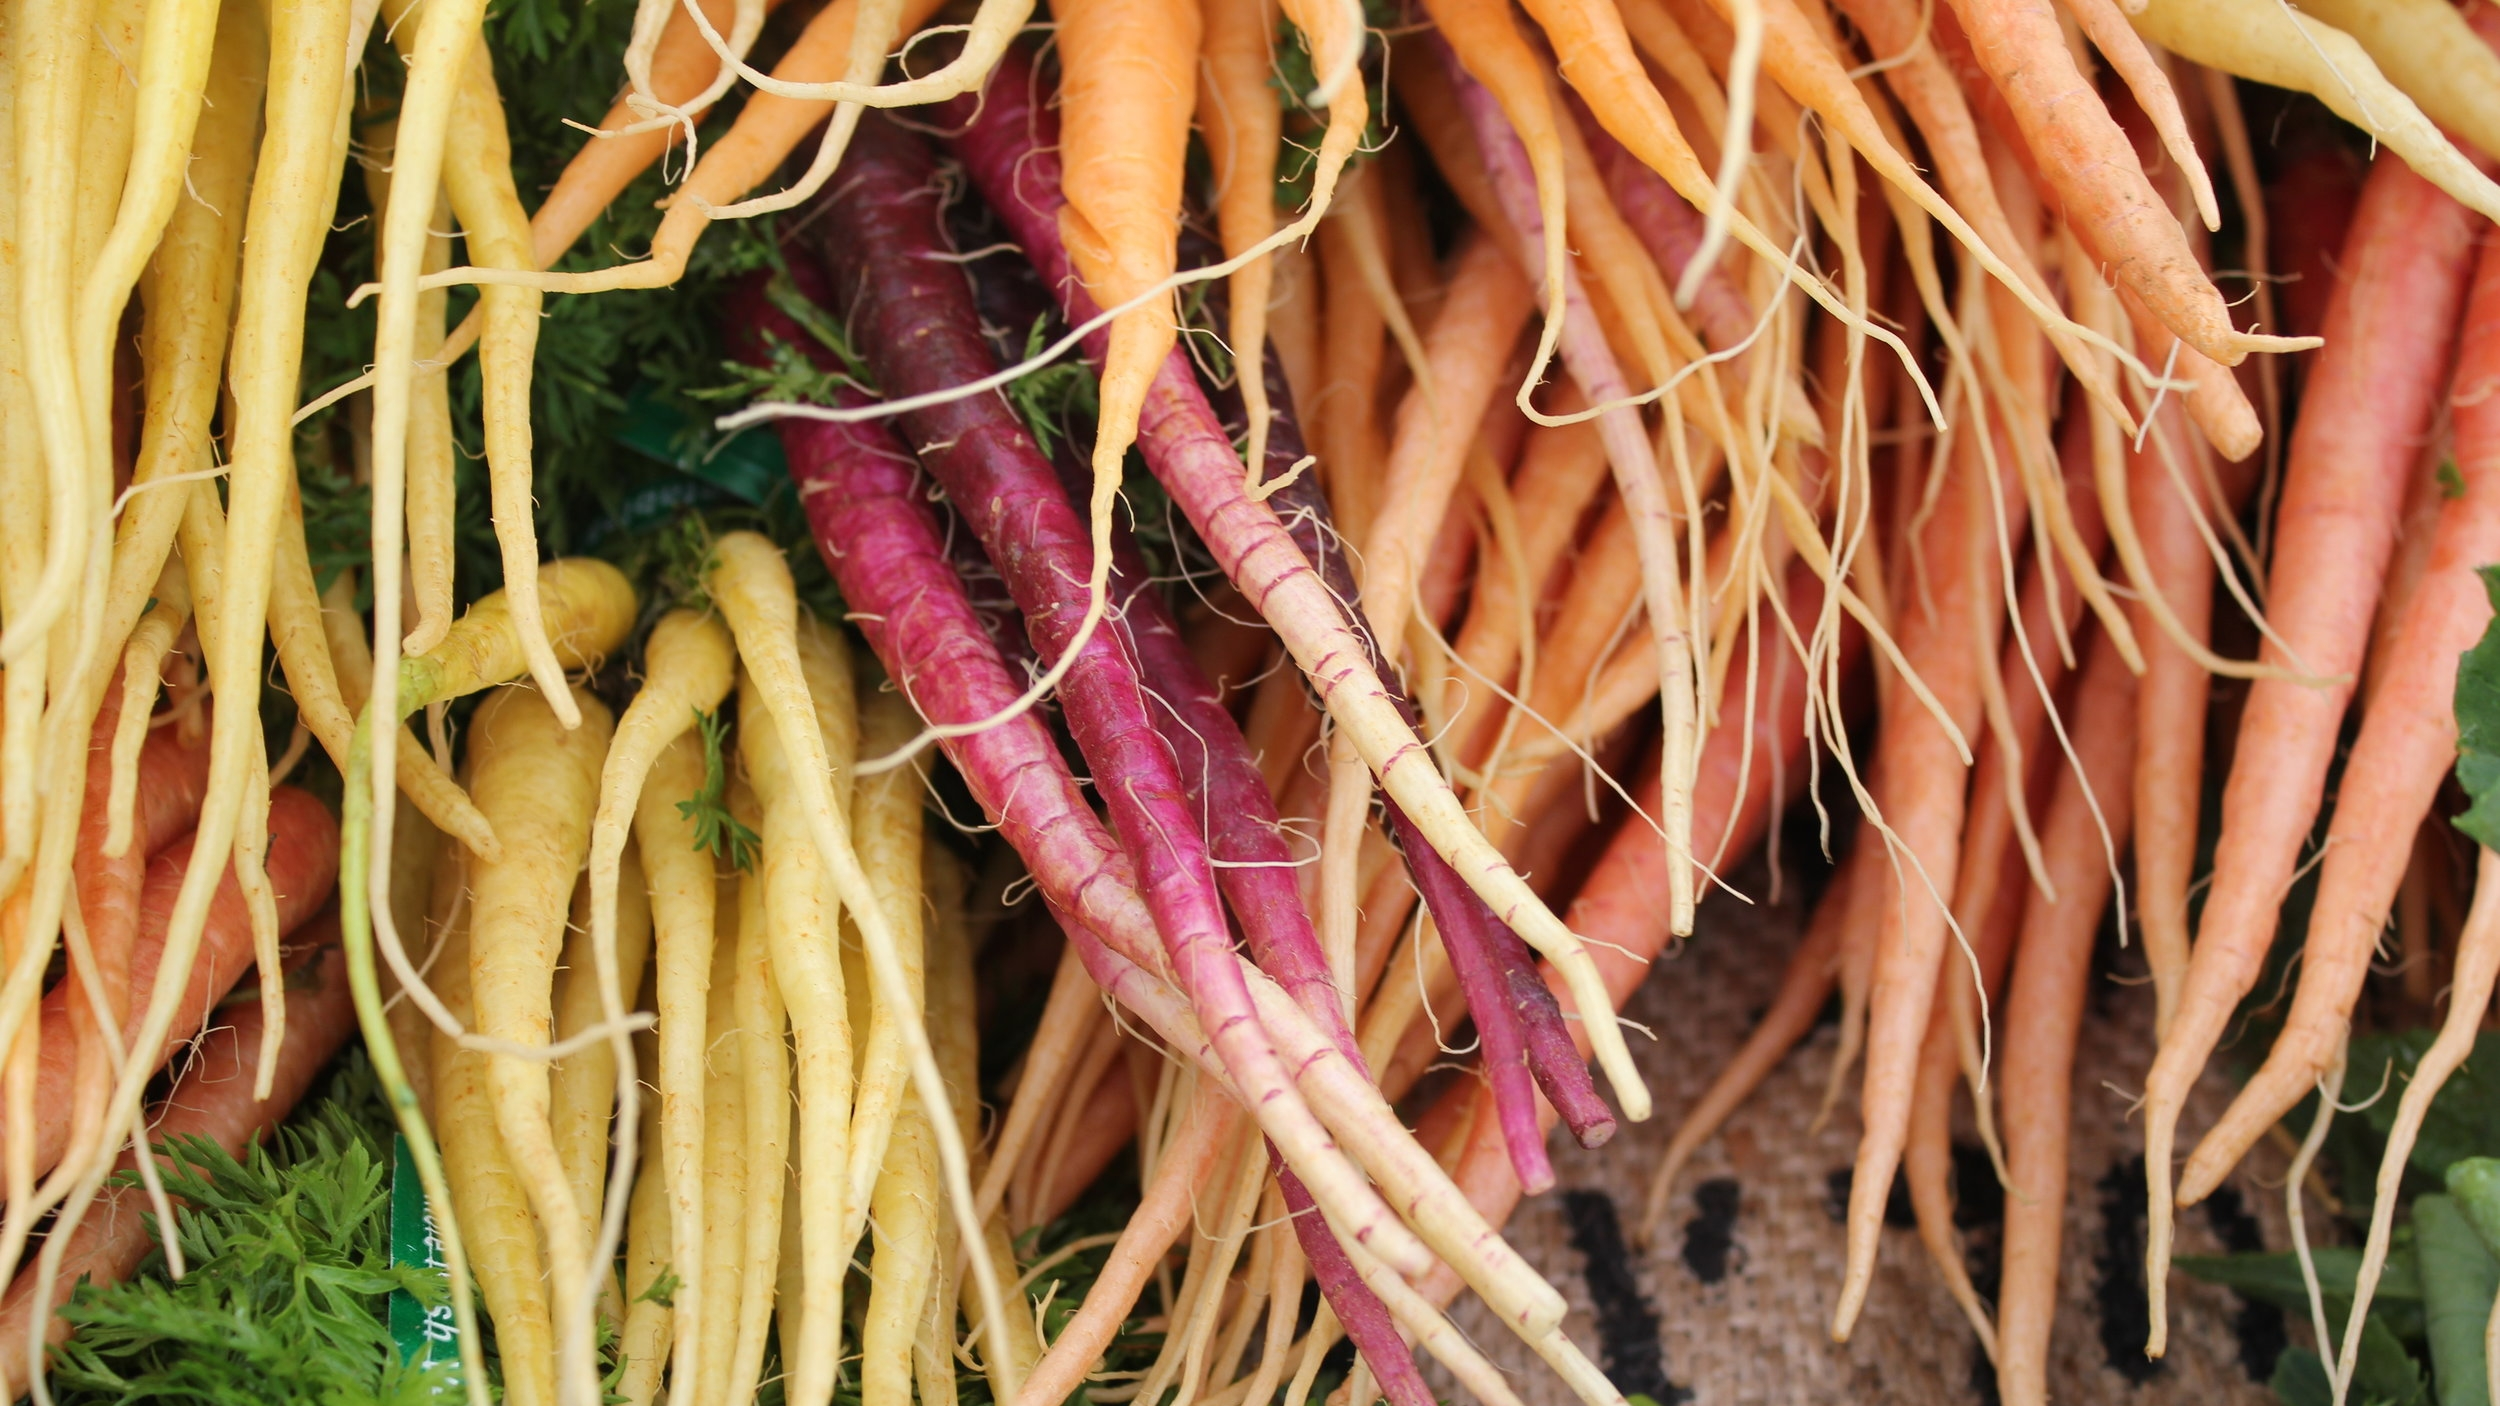 Weiser Fram Carrots